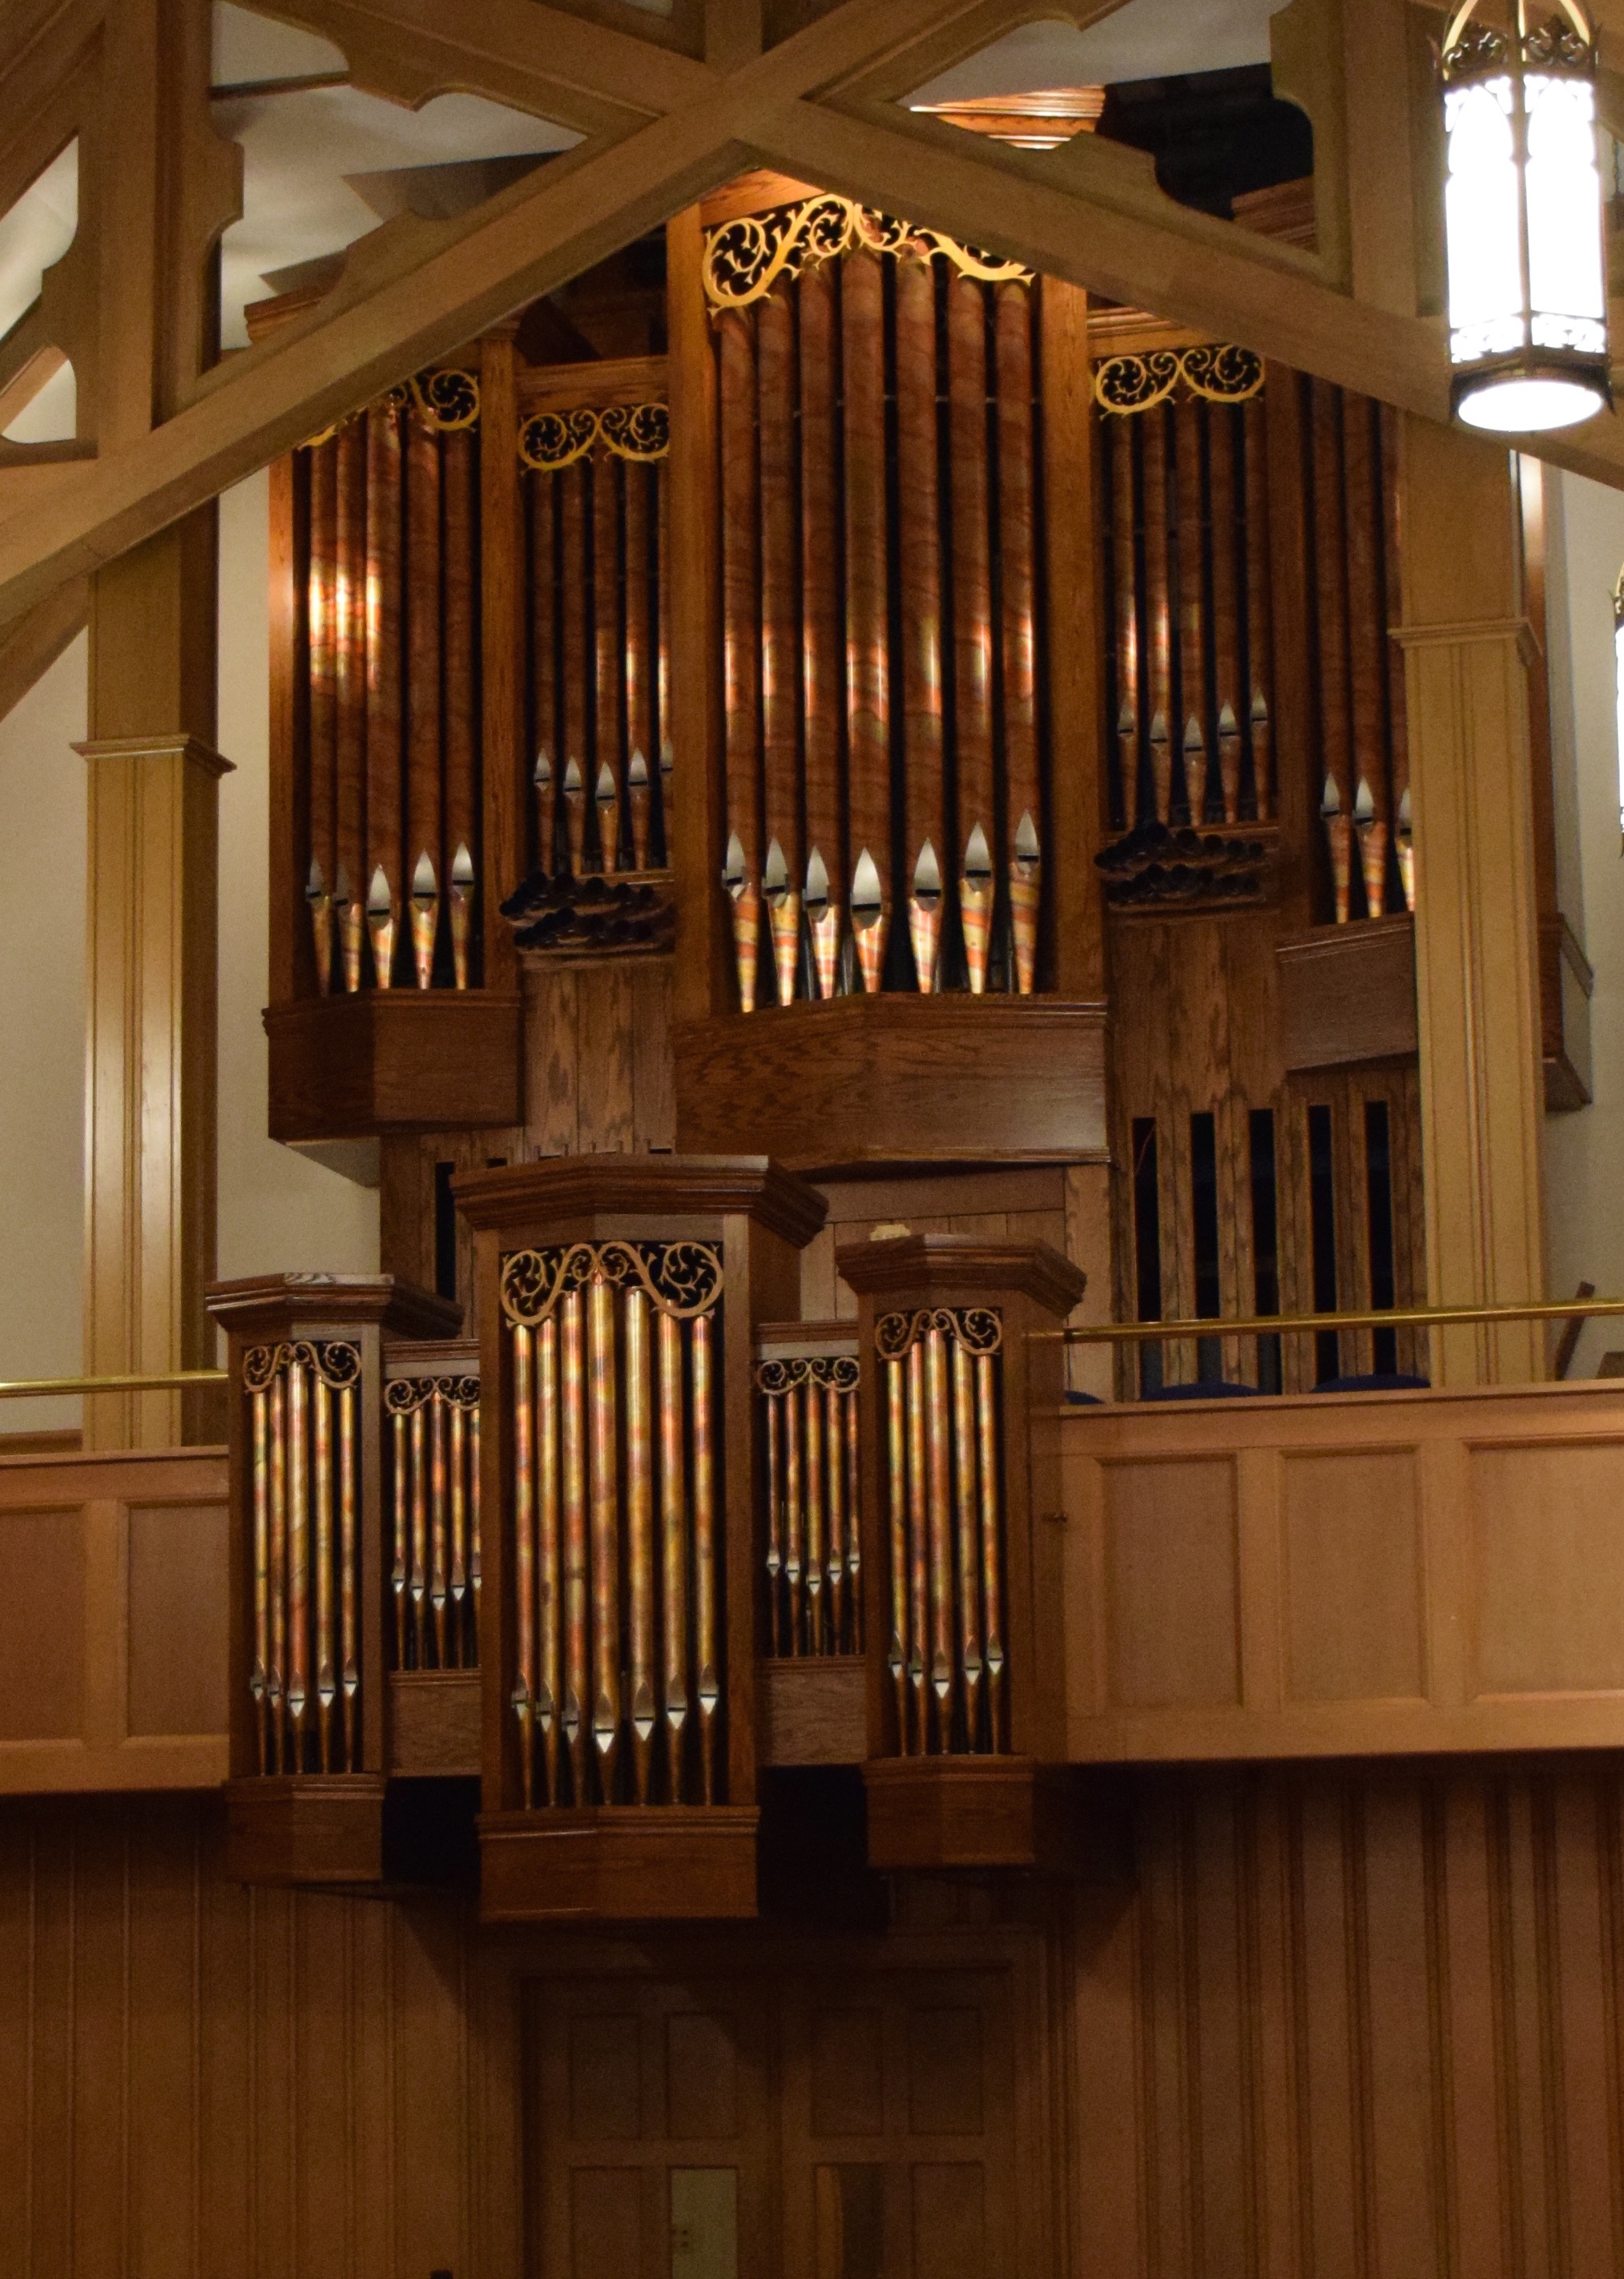 North Wilkesboro Presbyterian